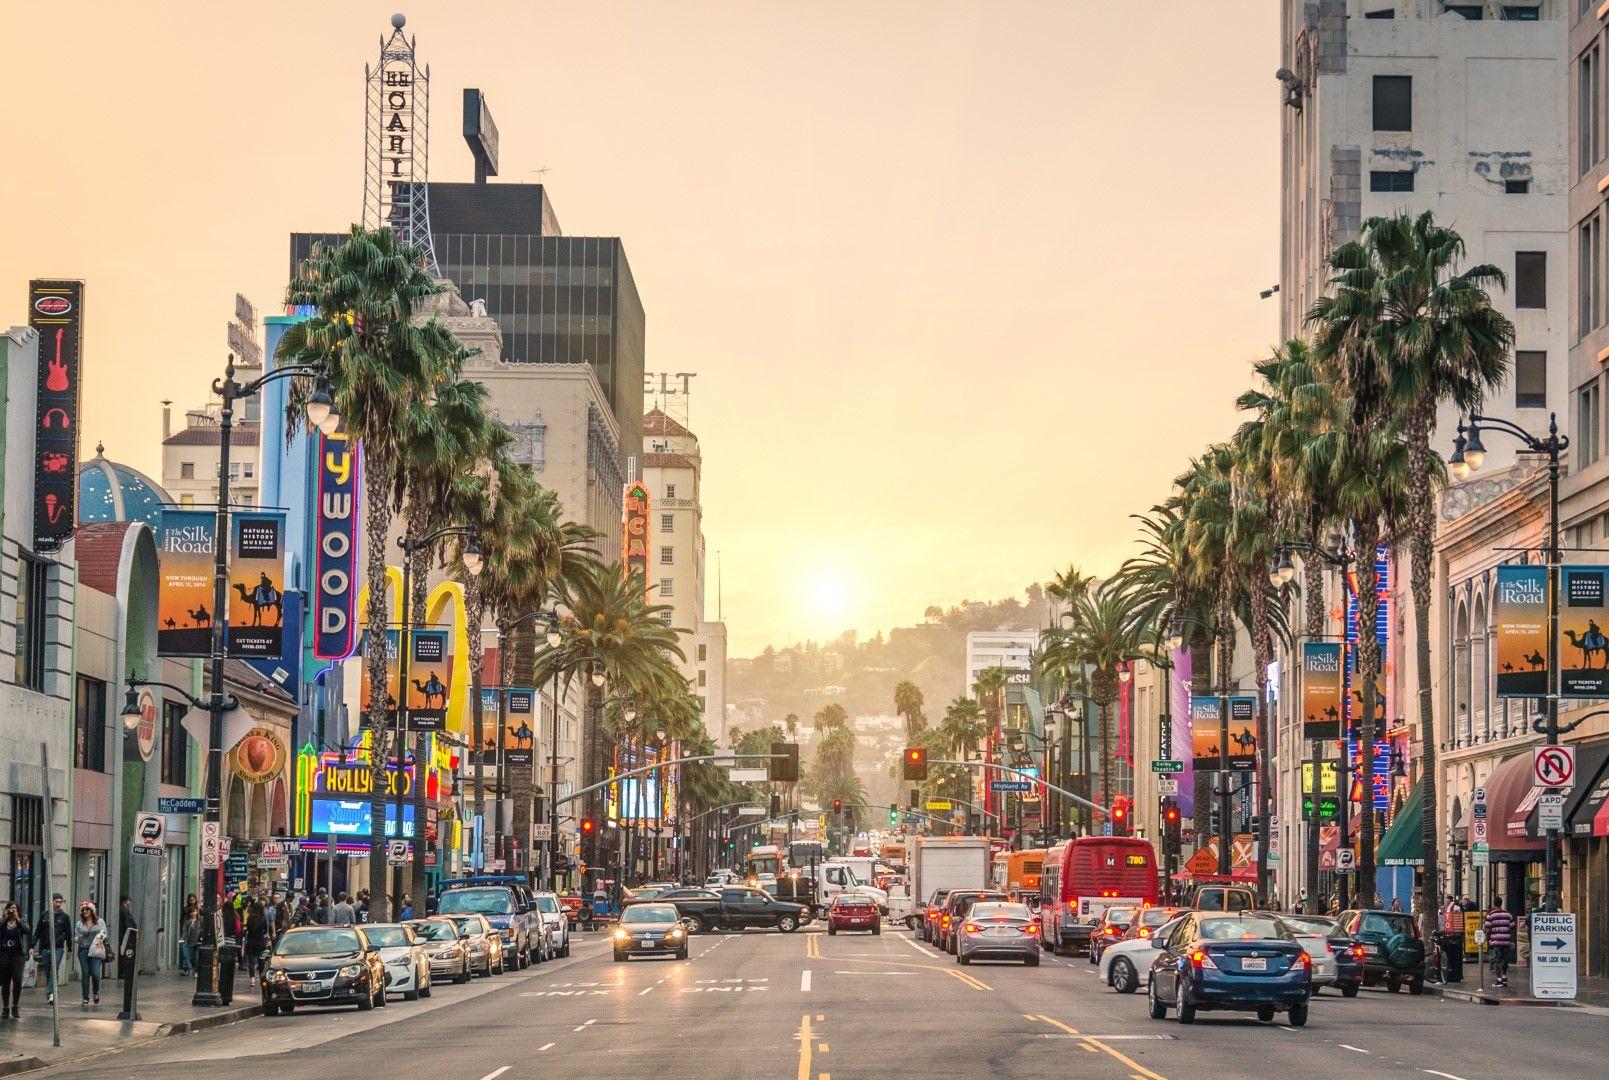 5. Sunset Boulevard, Лос Анджелис, САЩ